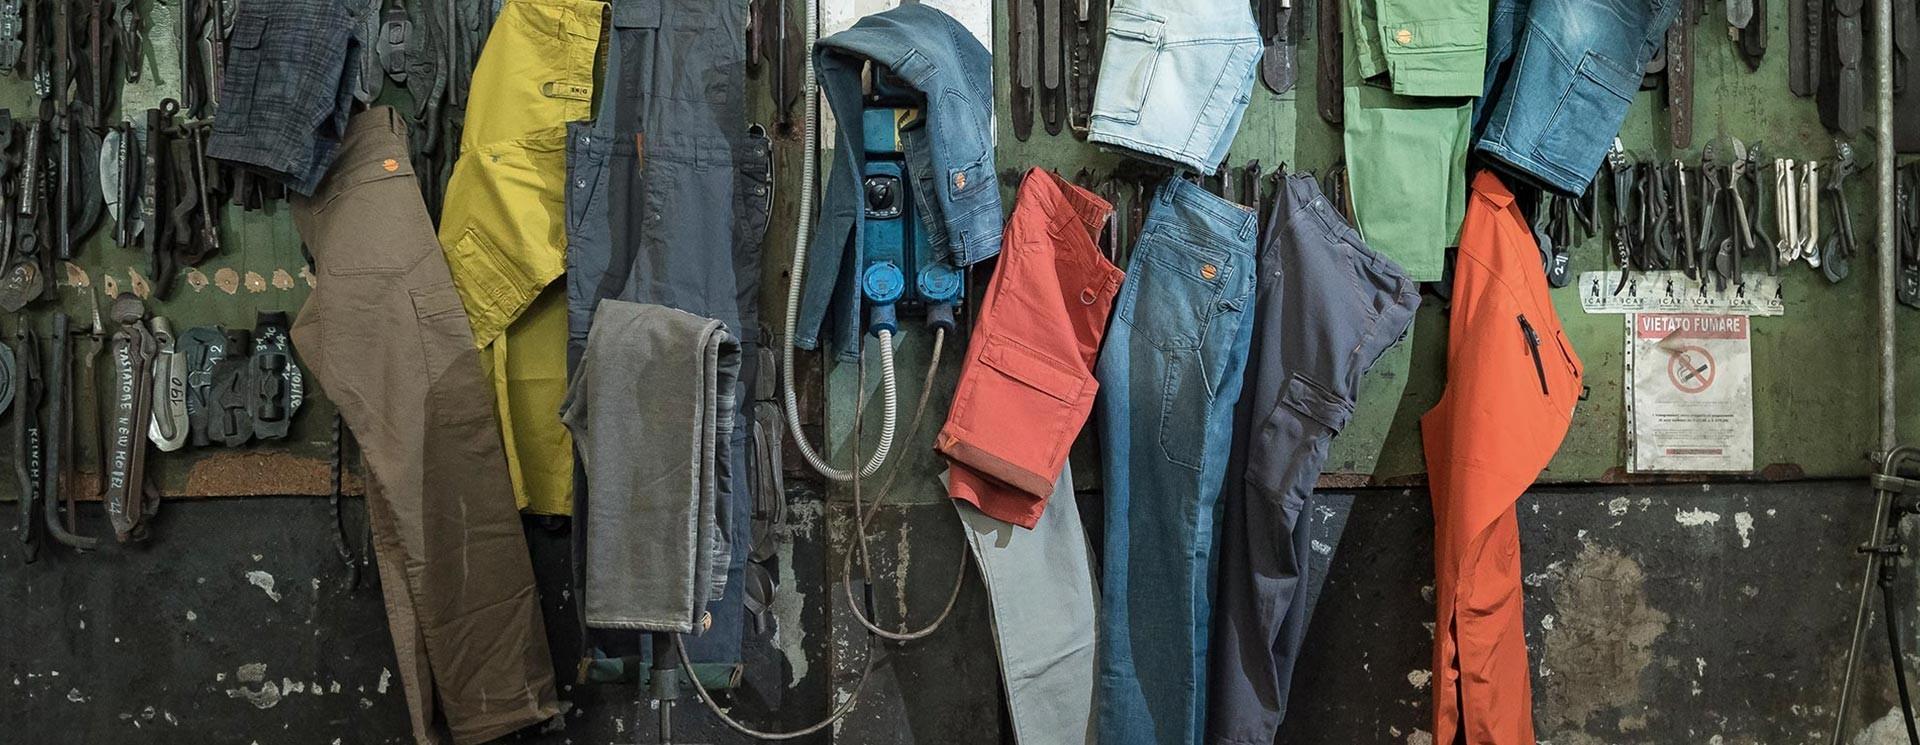 Pantalon de Travail - Vêtements de travail | Dike